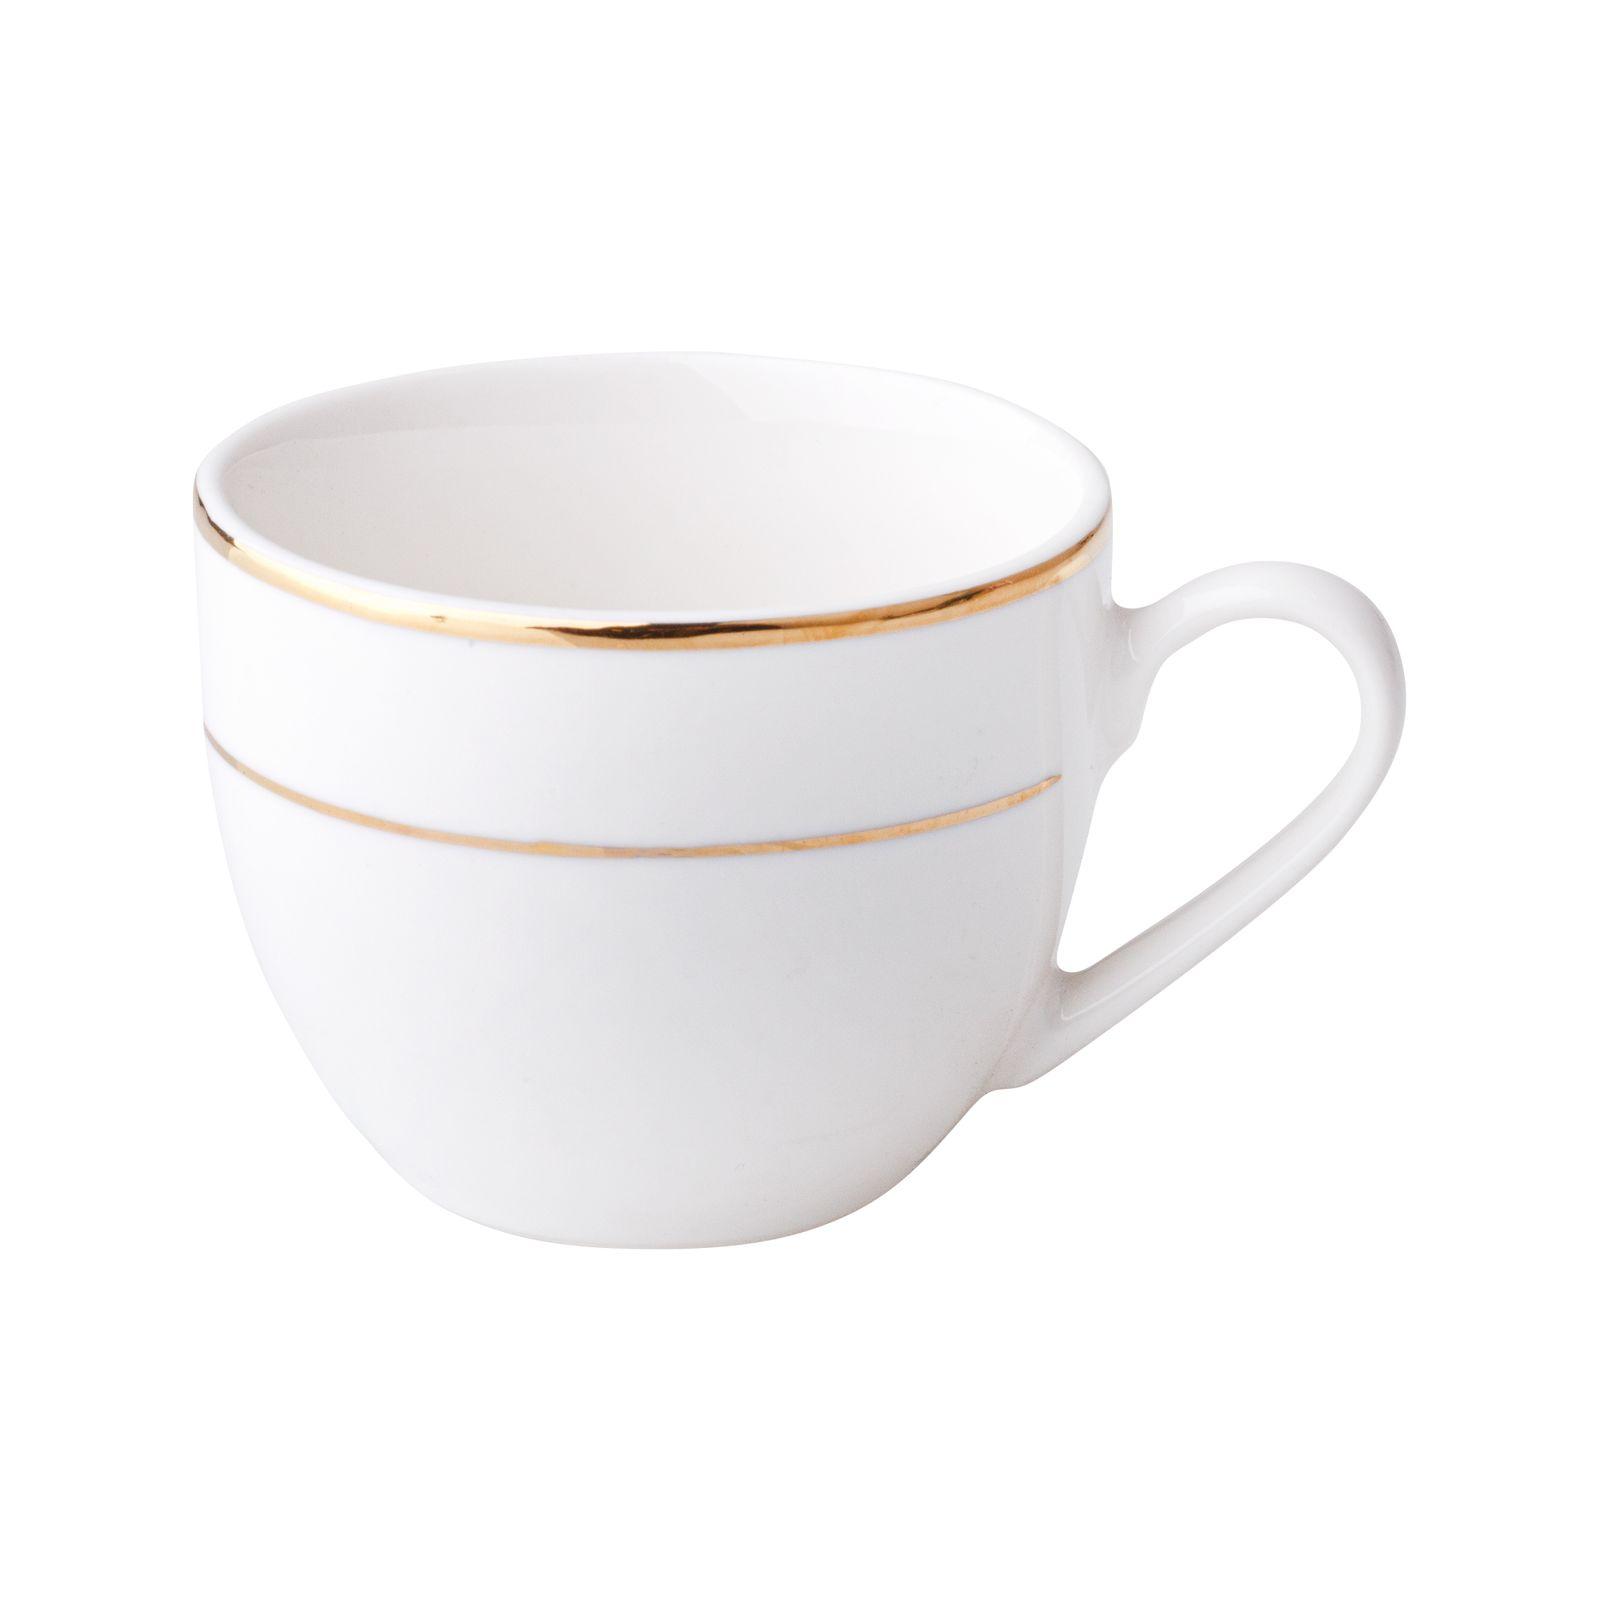 Filiżanka do espresso Aura Gold 90 ml AMBITION